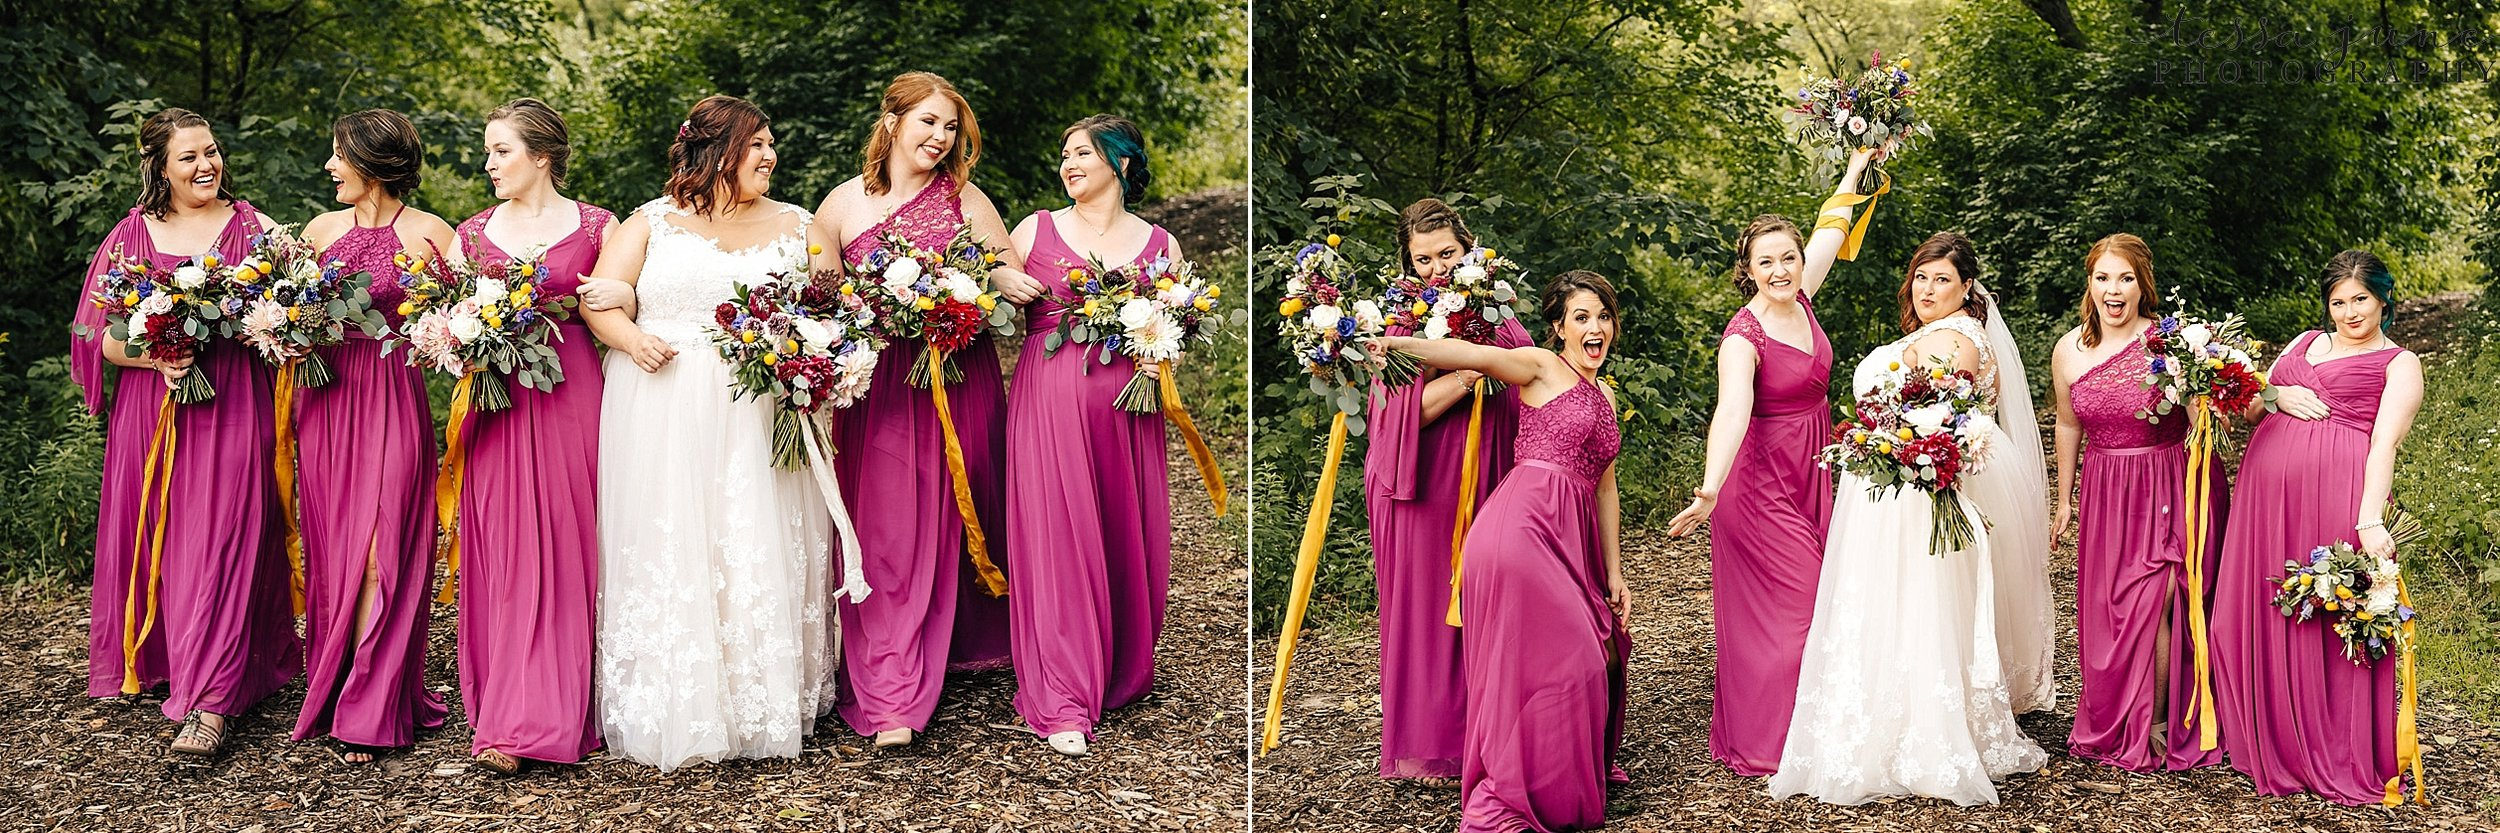 minneapolis-summer-wedding-at-silverwood-park-pristine-floral-82.jpg